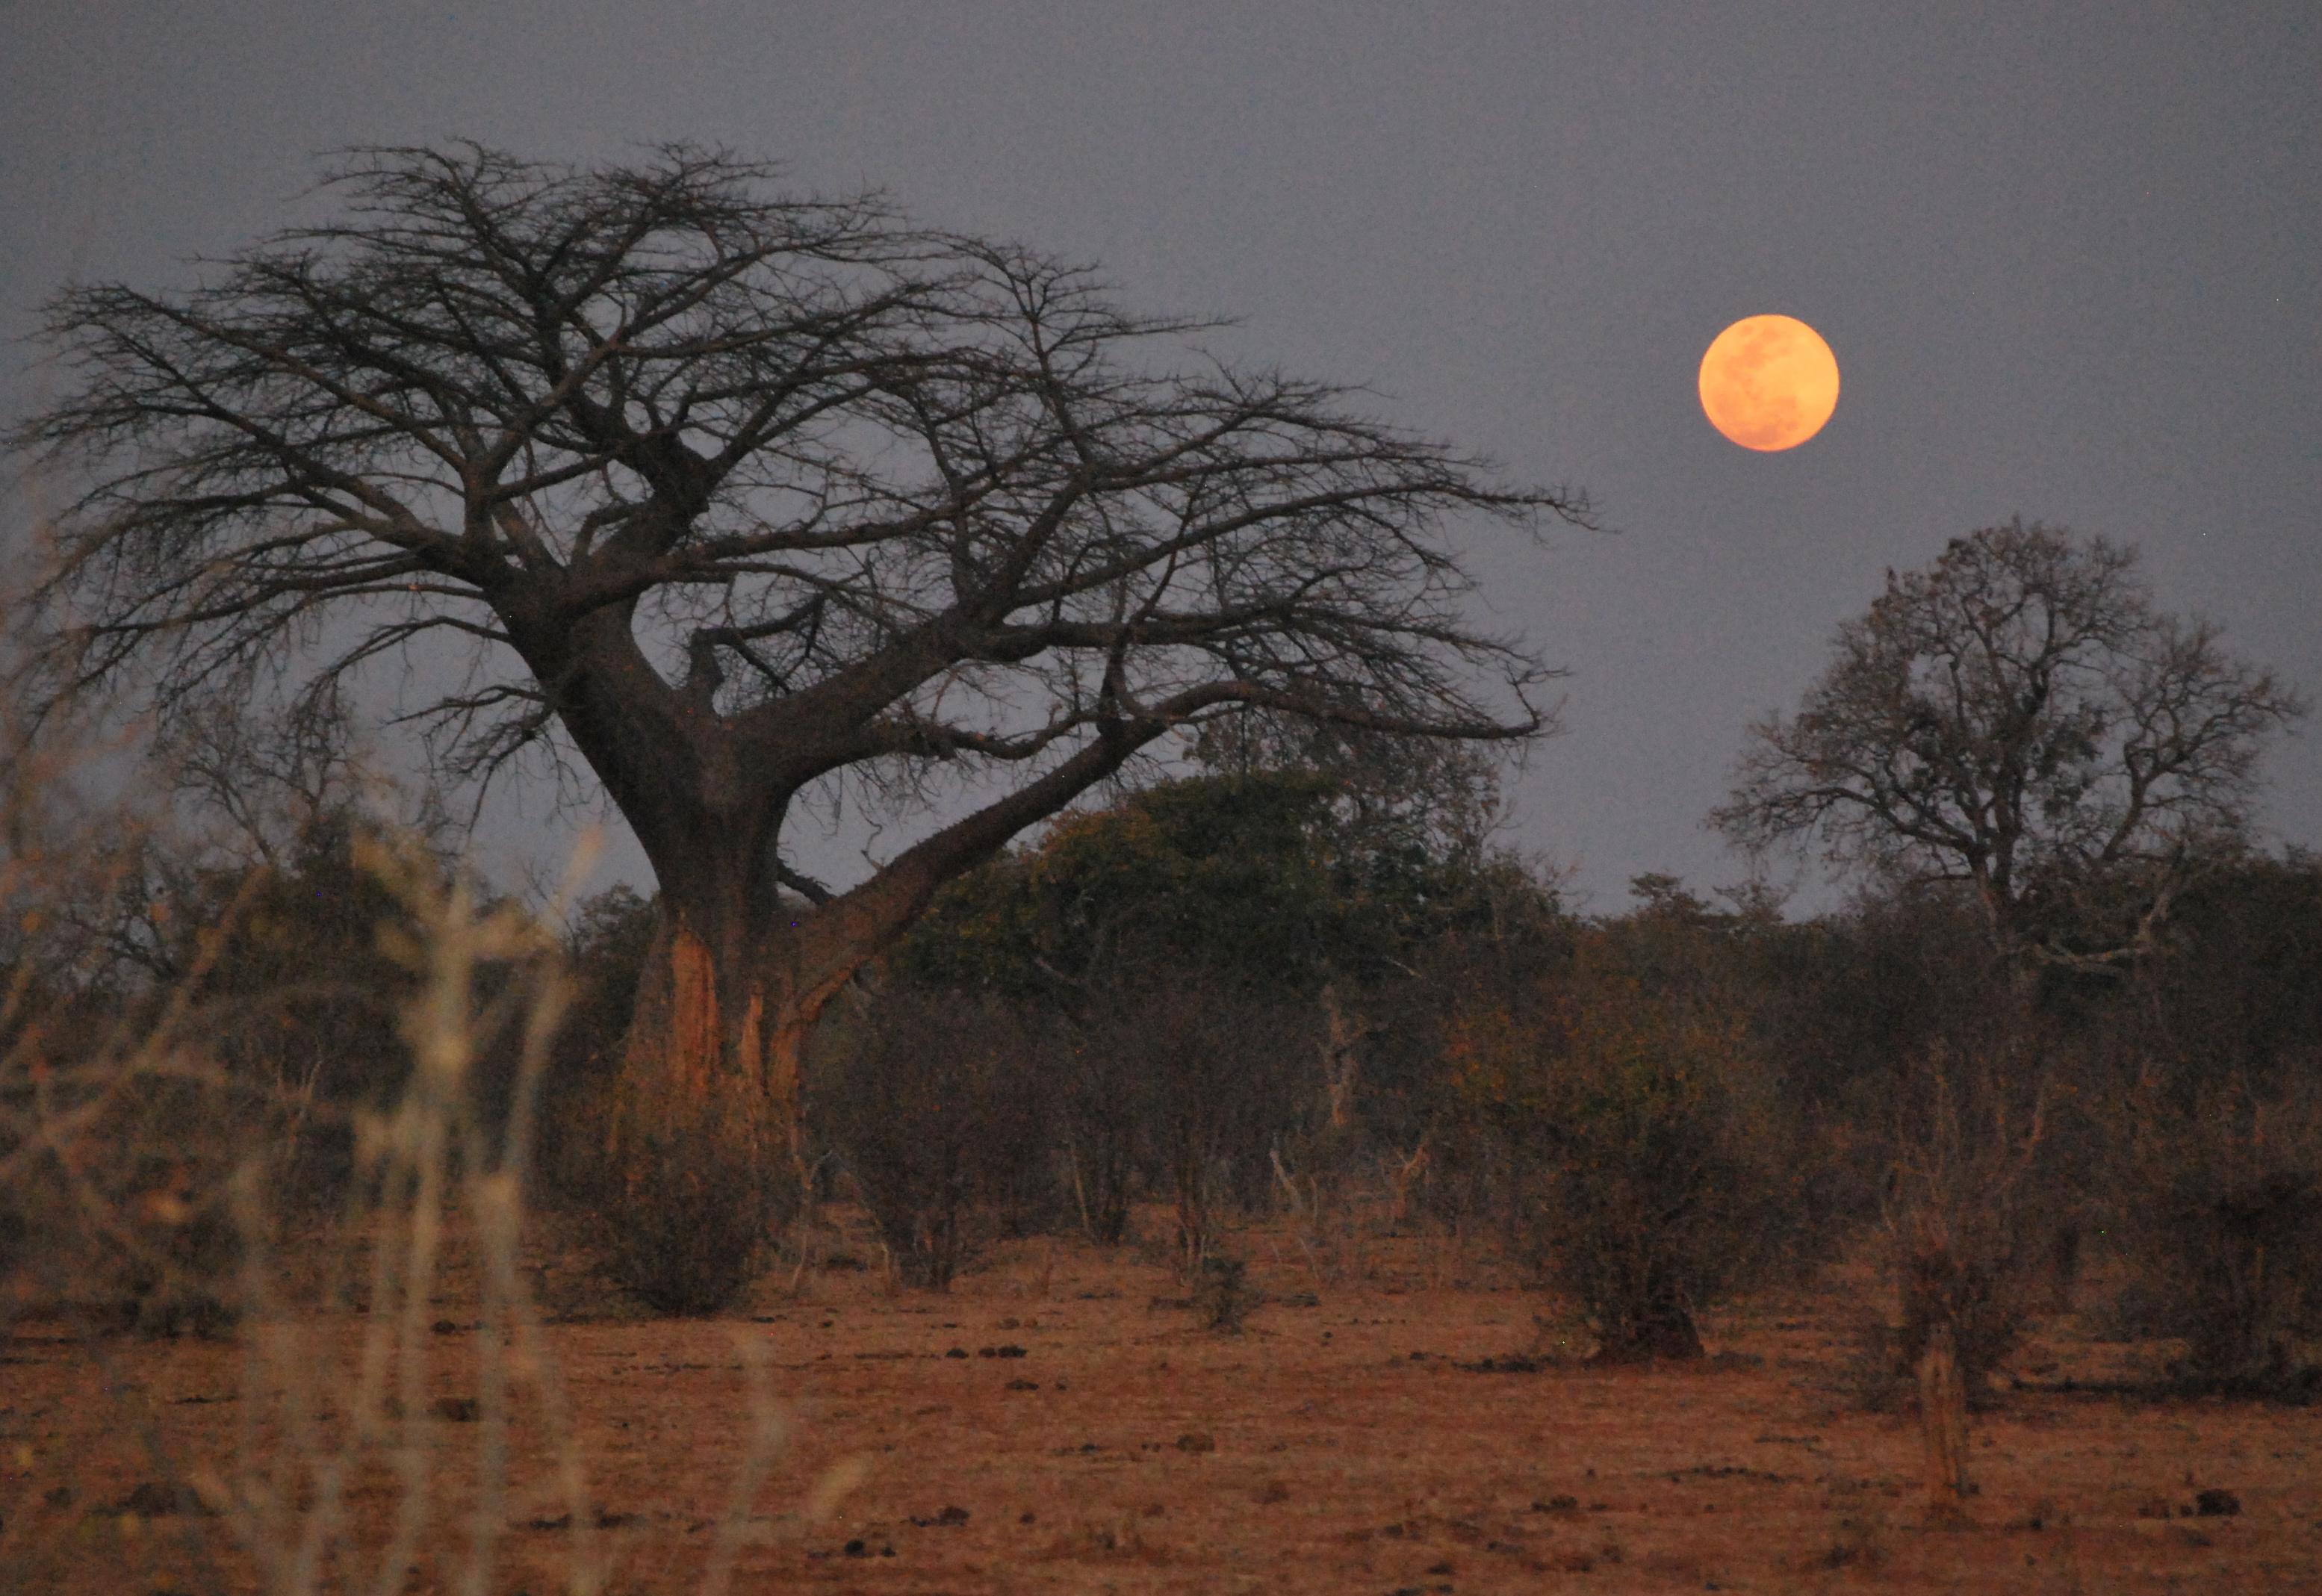 Botswana, Africa - Chobe National Park Safari Journey For 4